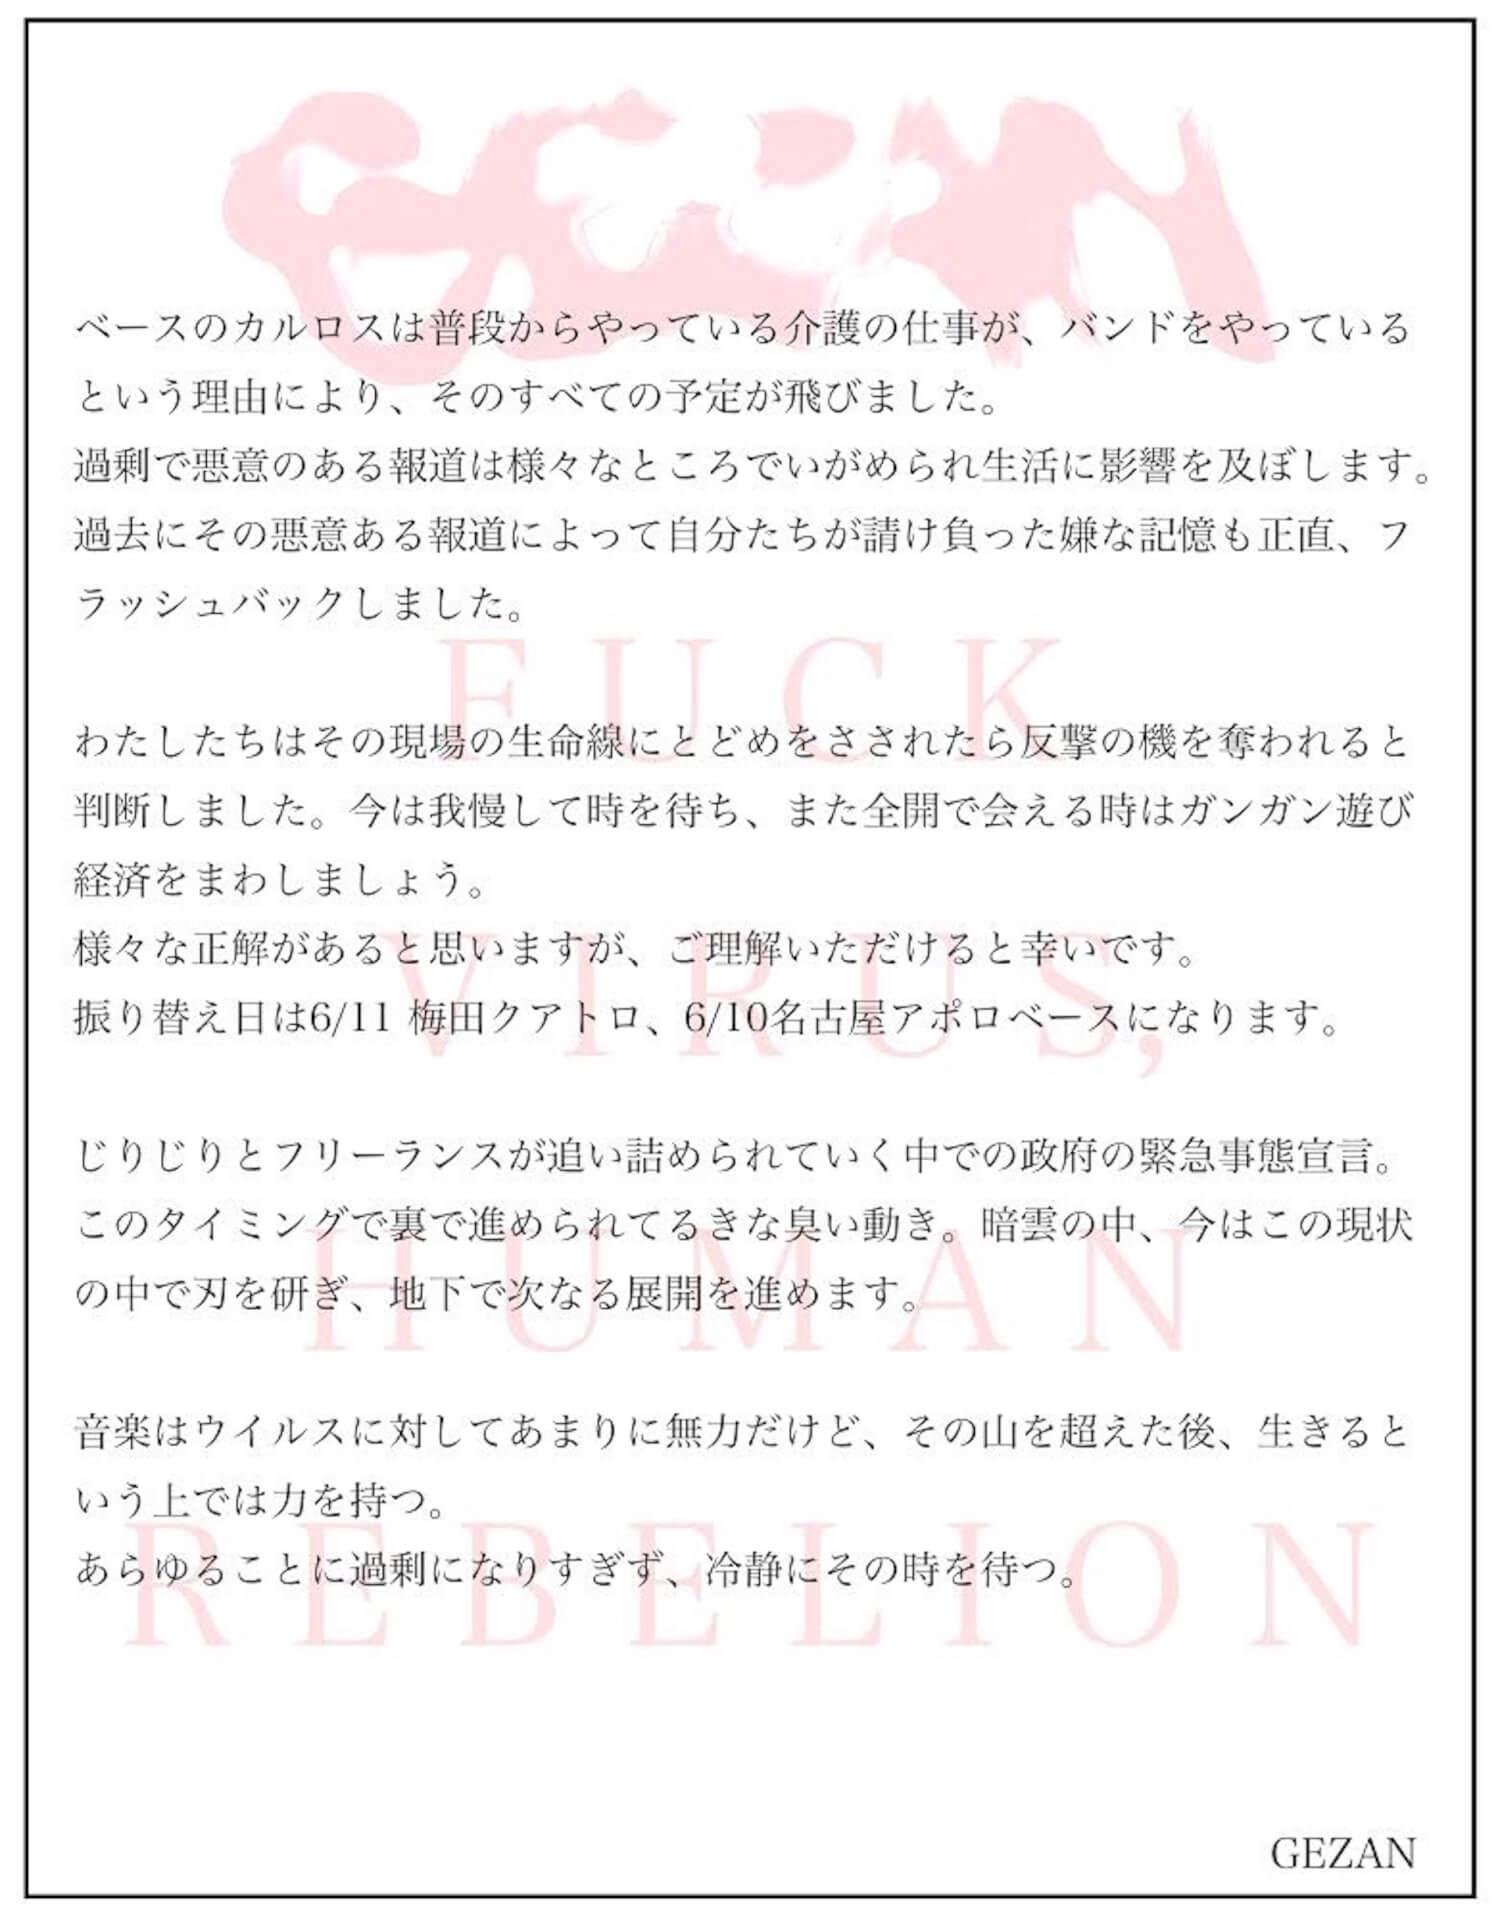 GEZAN『狂(KLUE)』リリースツアーの大阪・名古屋公演が新型コロナウイルスのため延期に|6月に振替公演を予定 music0311_gezanhurikae_04